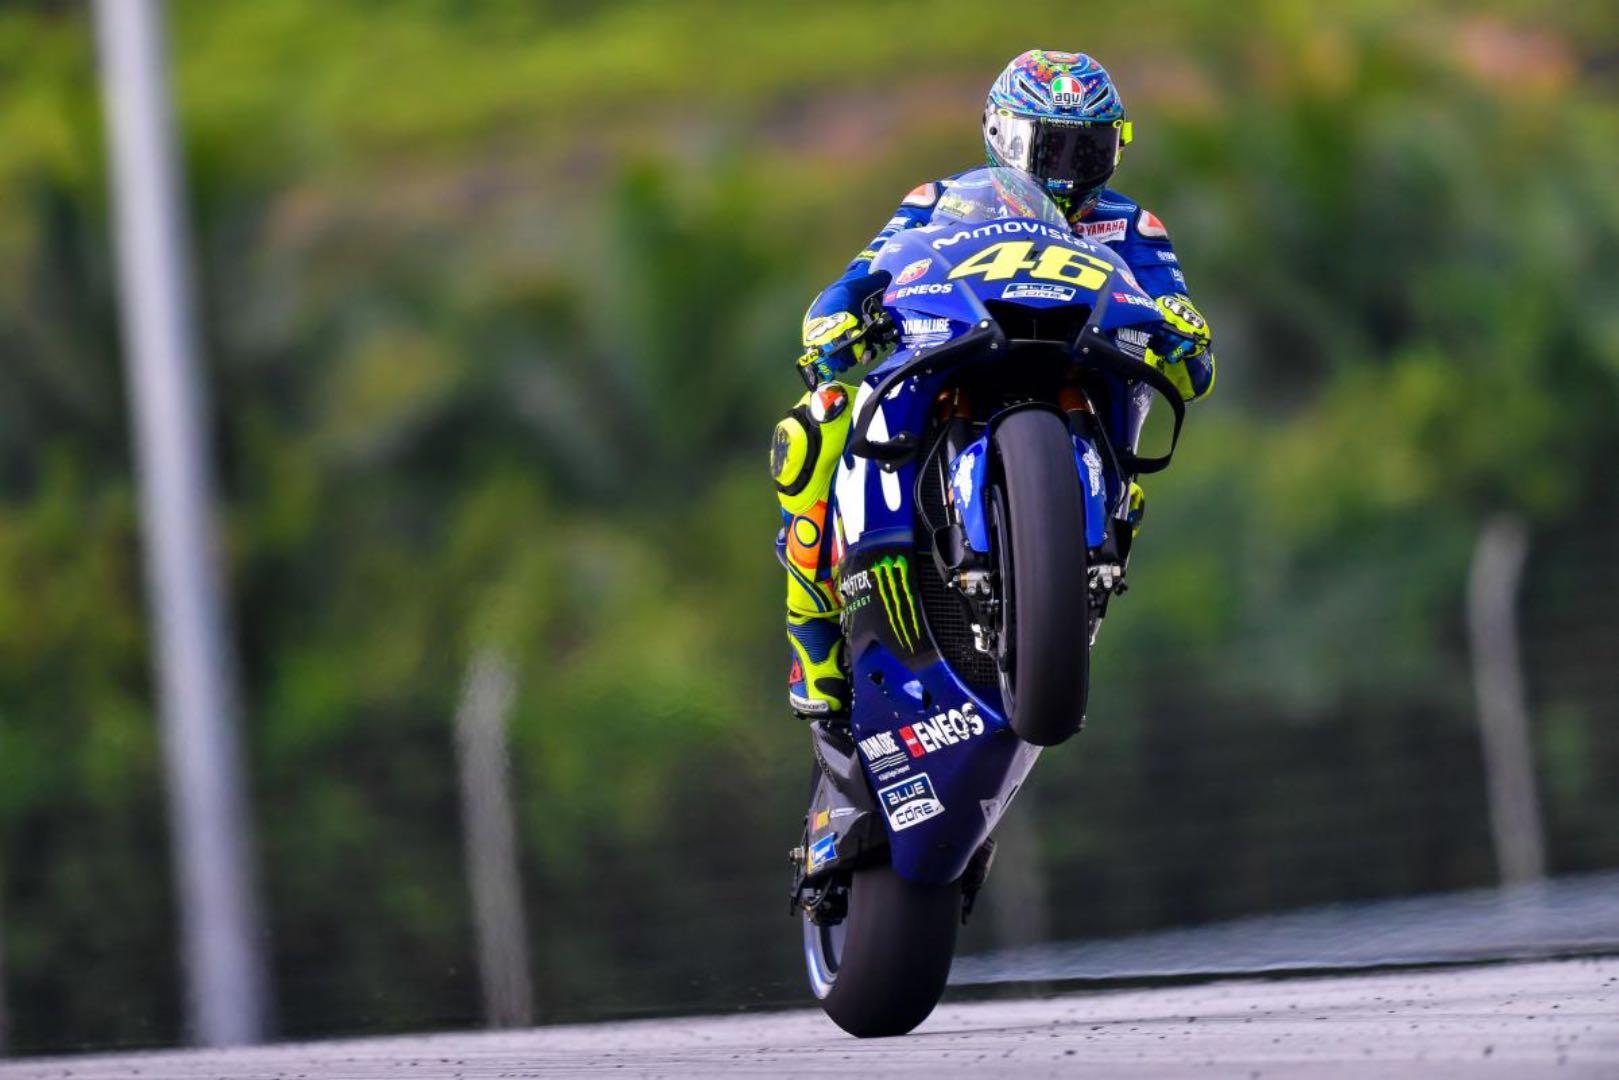 2018 Sepang MotoGP Test Results: Yamaha's Valentino Rossi